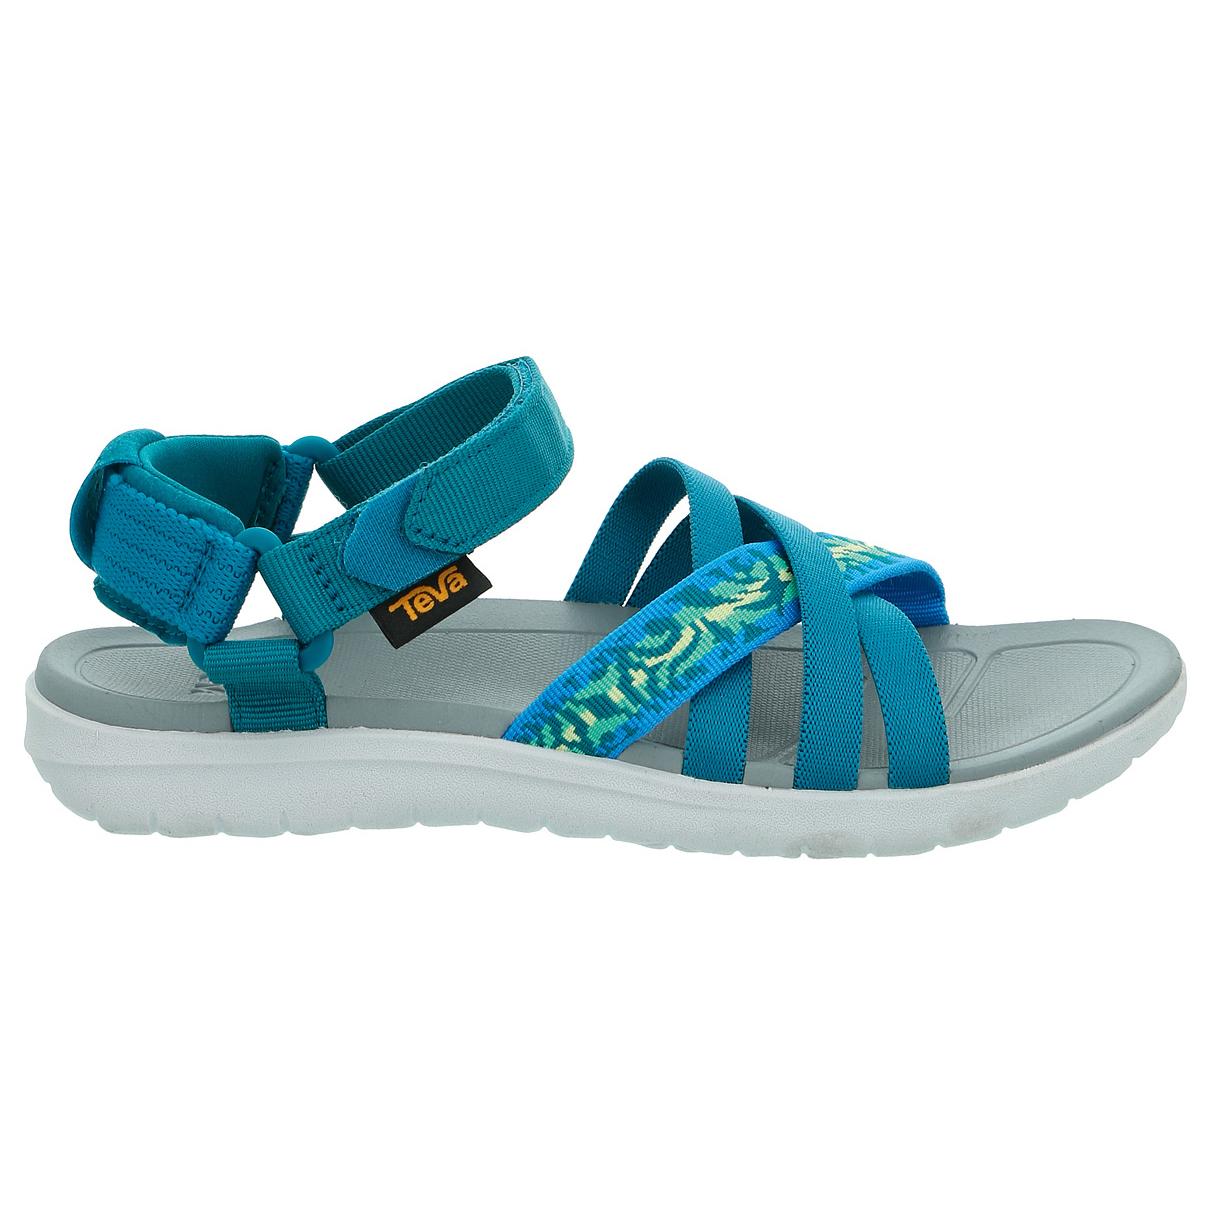 Teva Sanborn Sandal - Sandalen Damen online kaufen